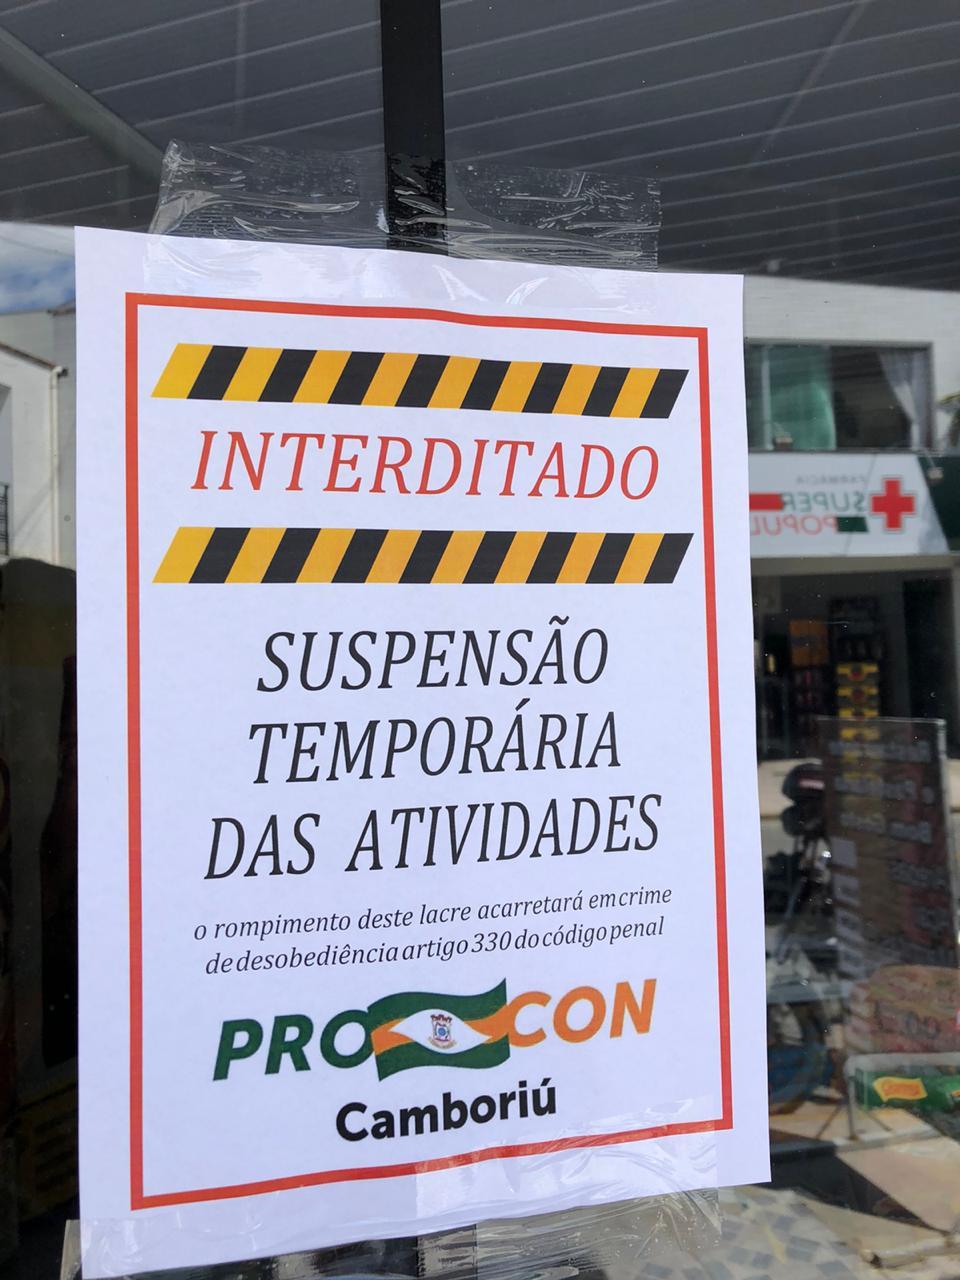 Procon interdita comércio em Camboriú